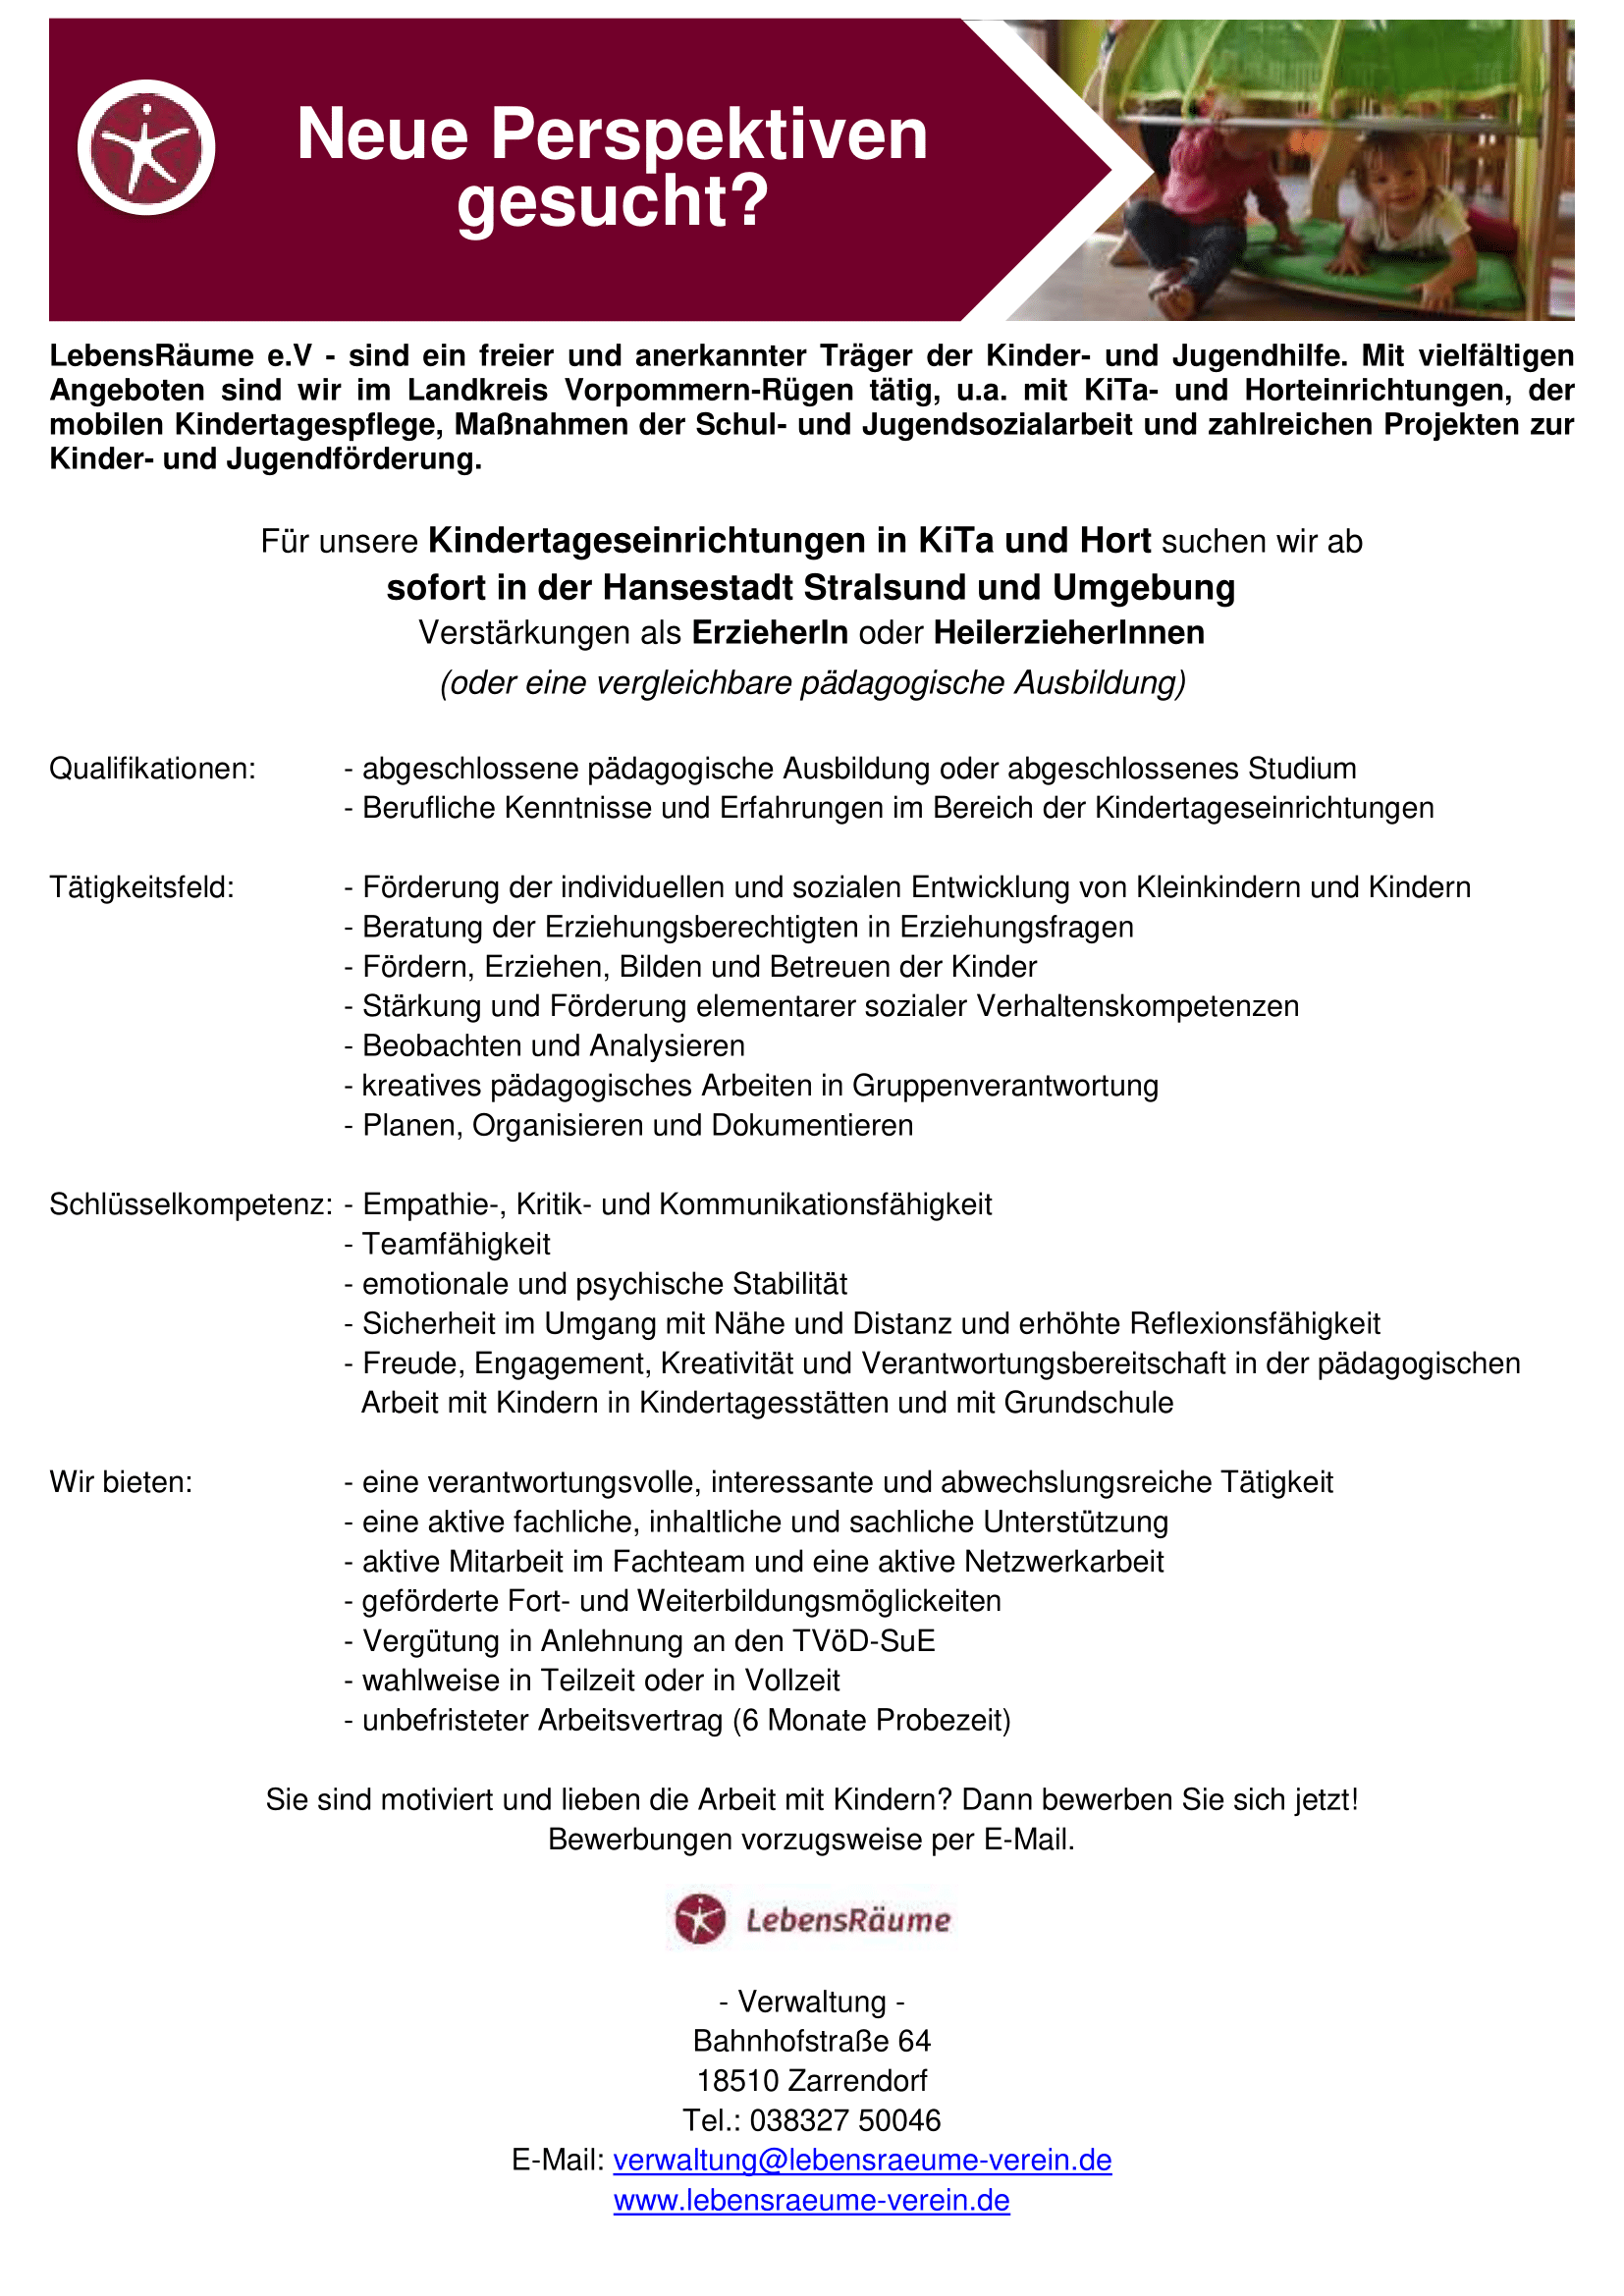 Stellenausschreibung Kita & Hort